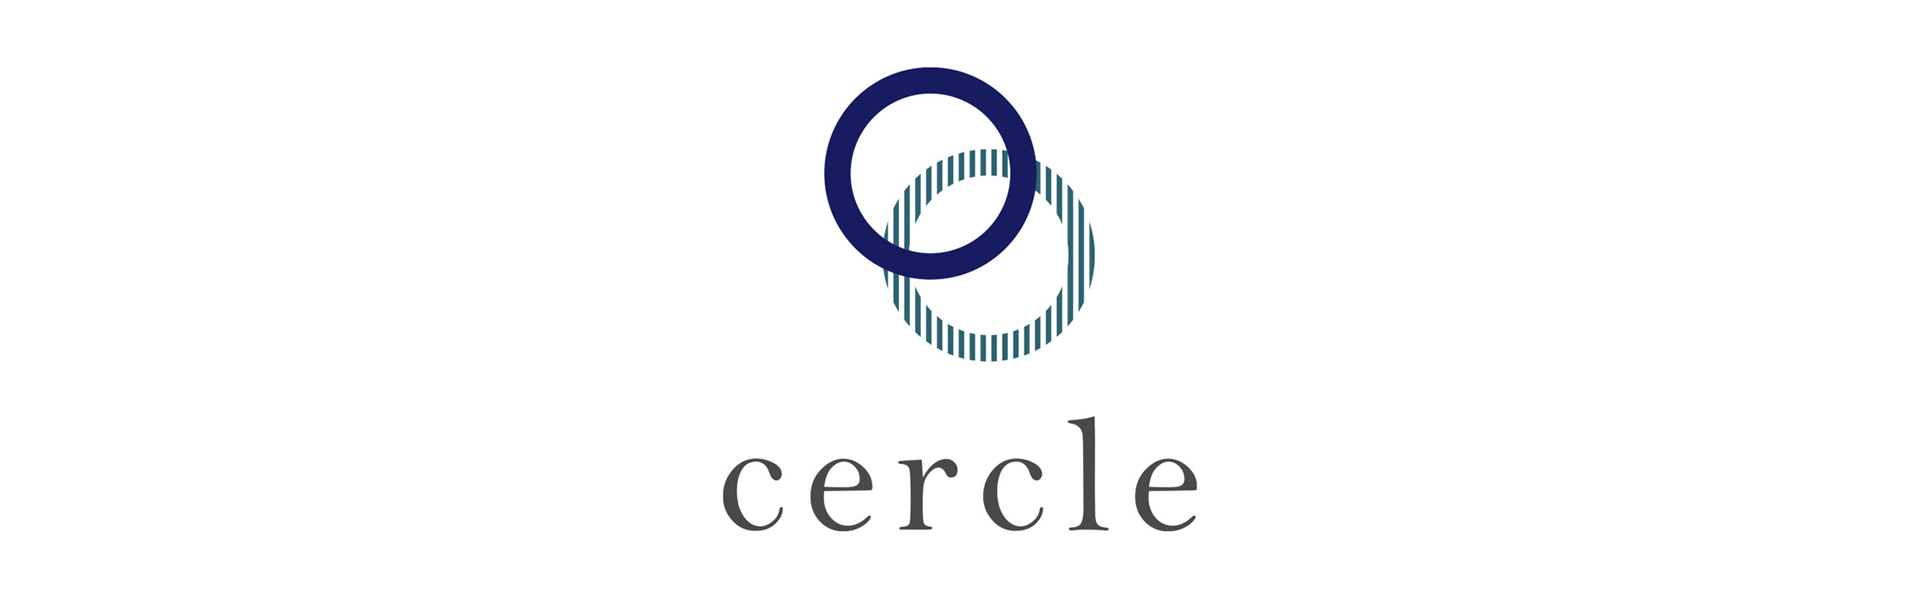 cercle ロゴ